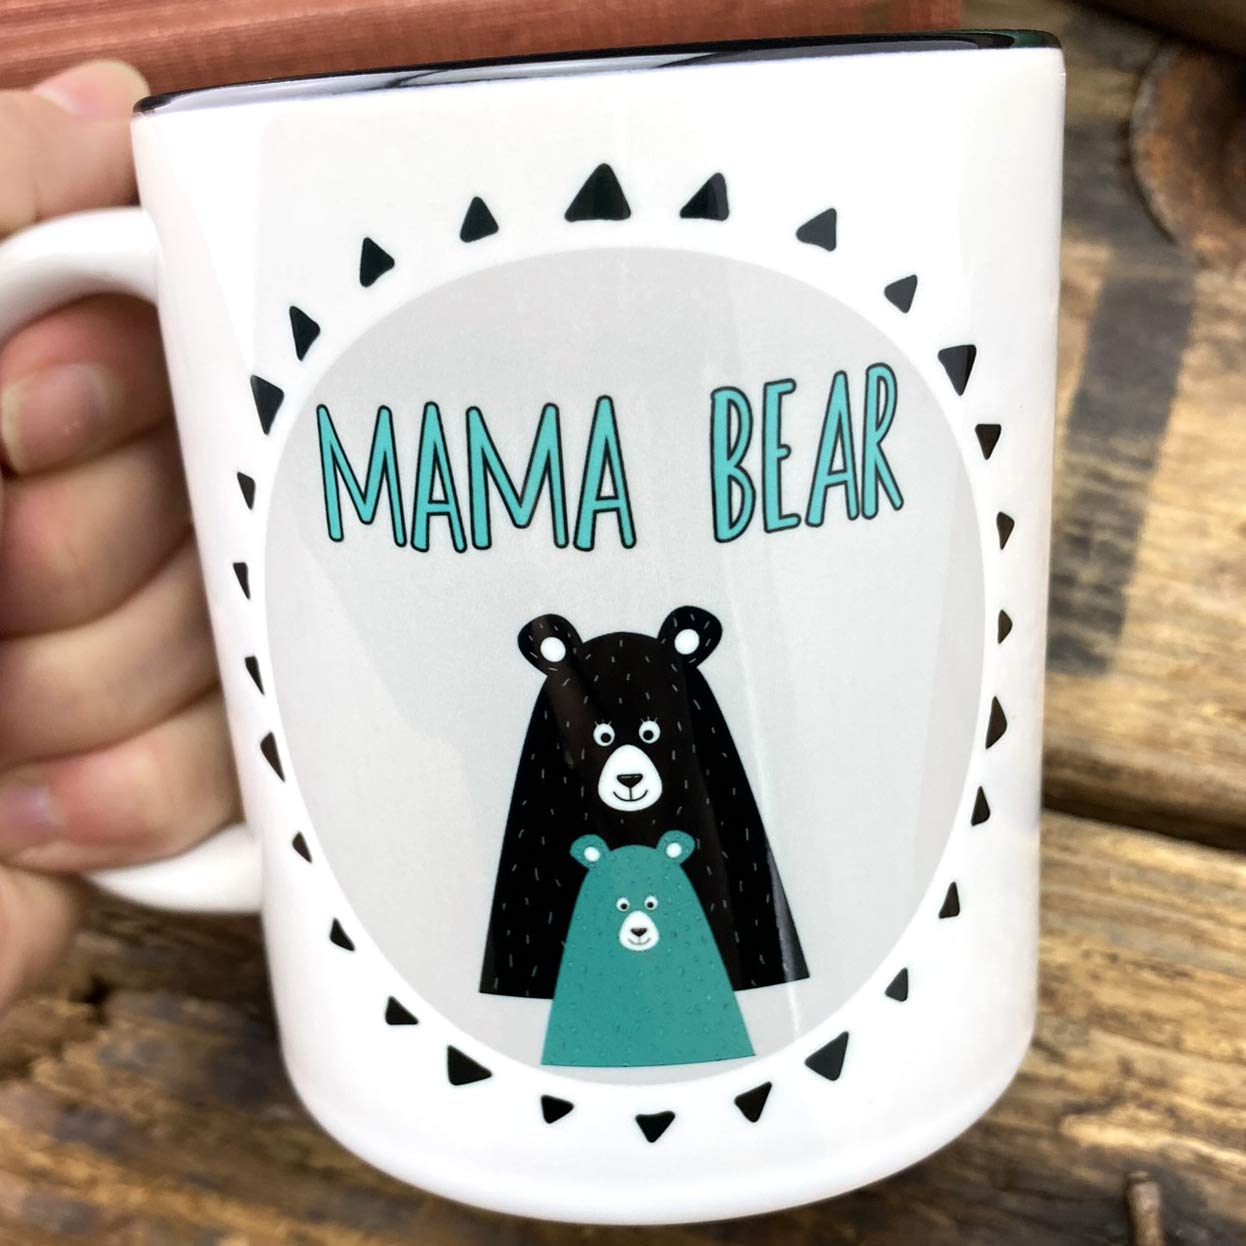 Mama Bear Mug - One supreme Baby Mom Cub Moth Present For Thoughtful OFFer